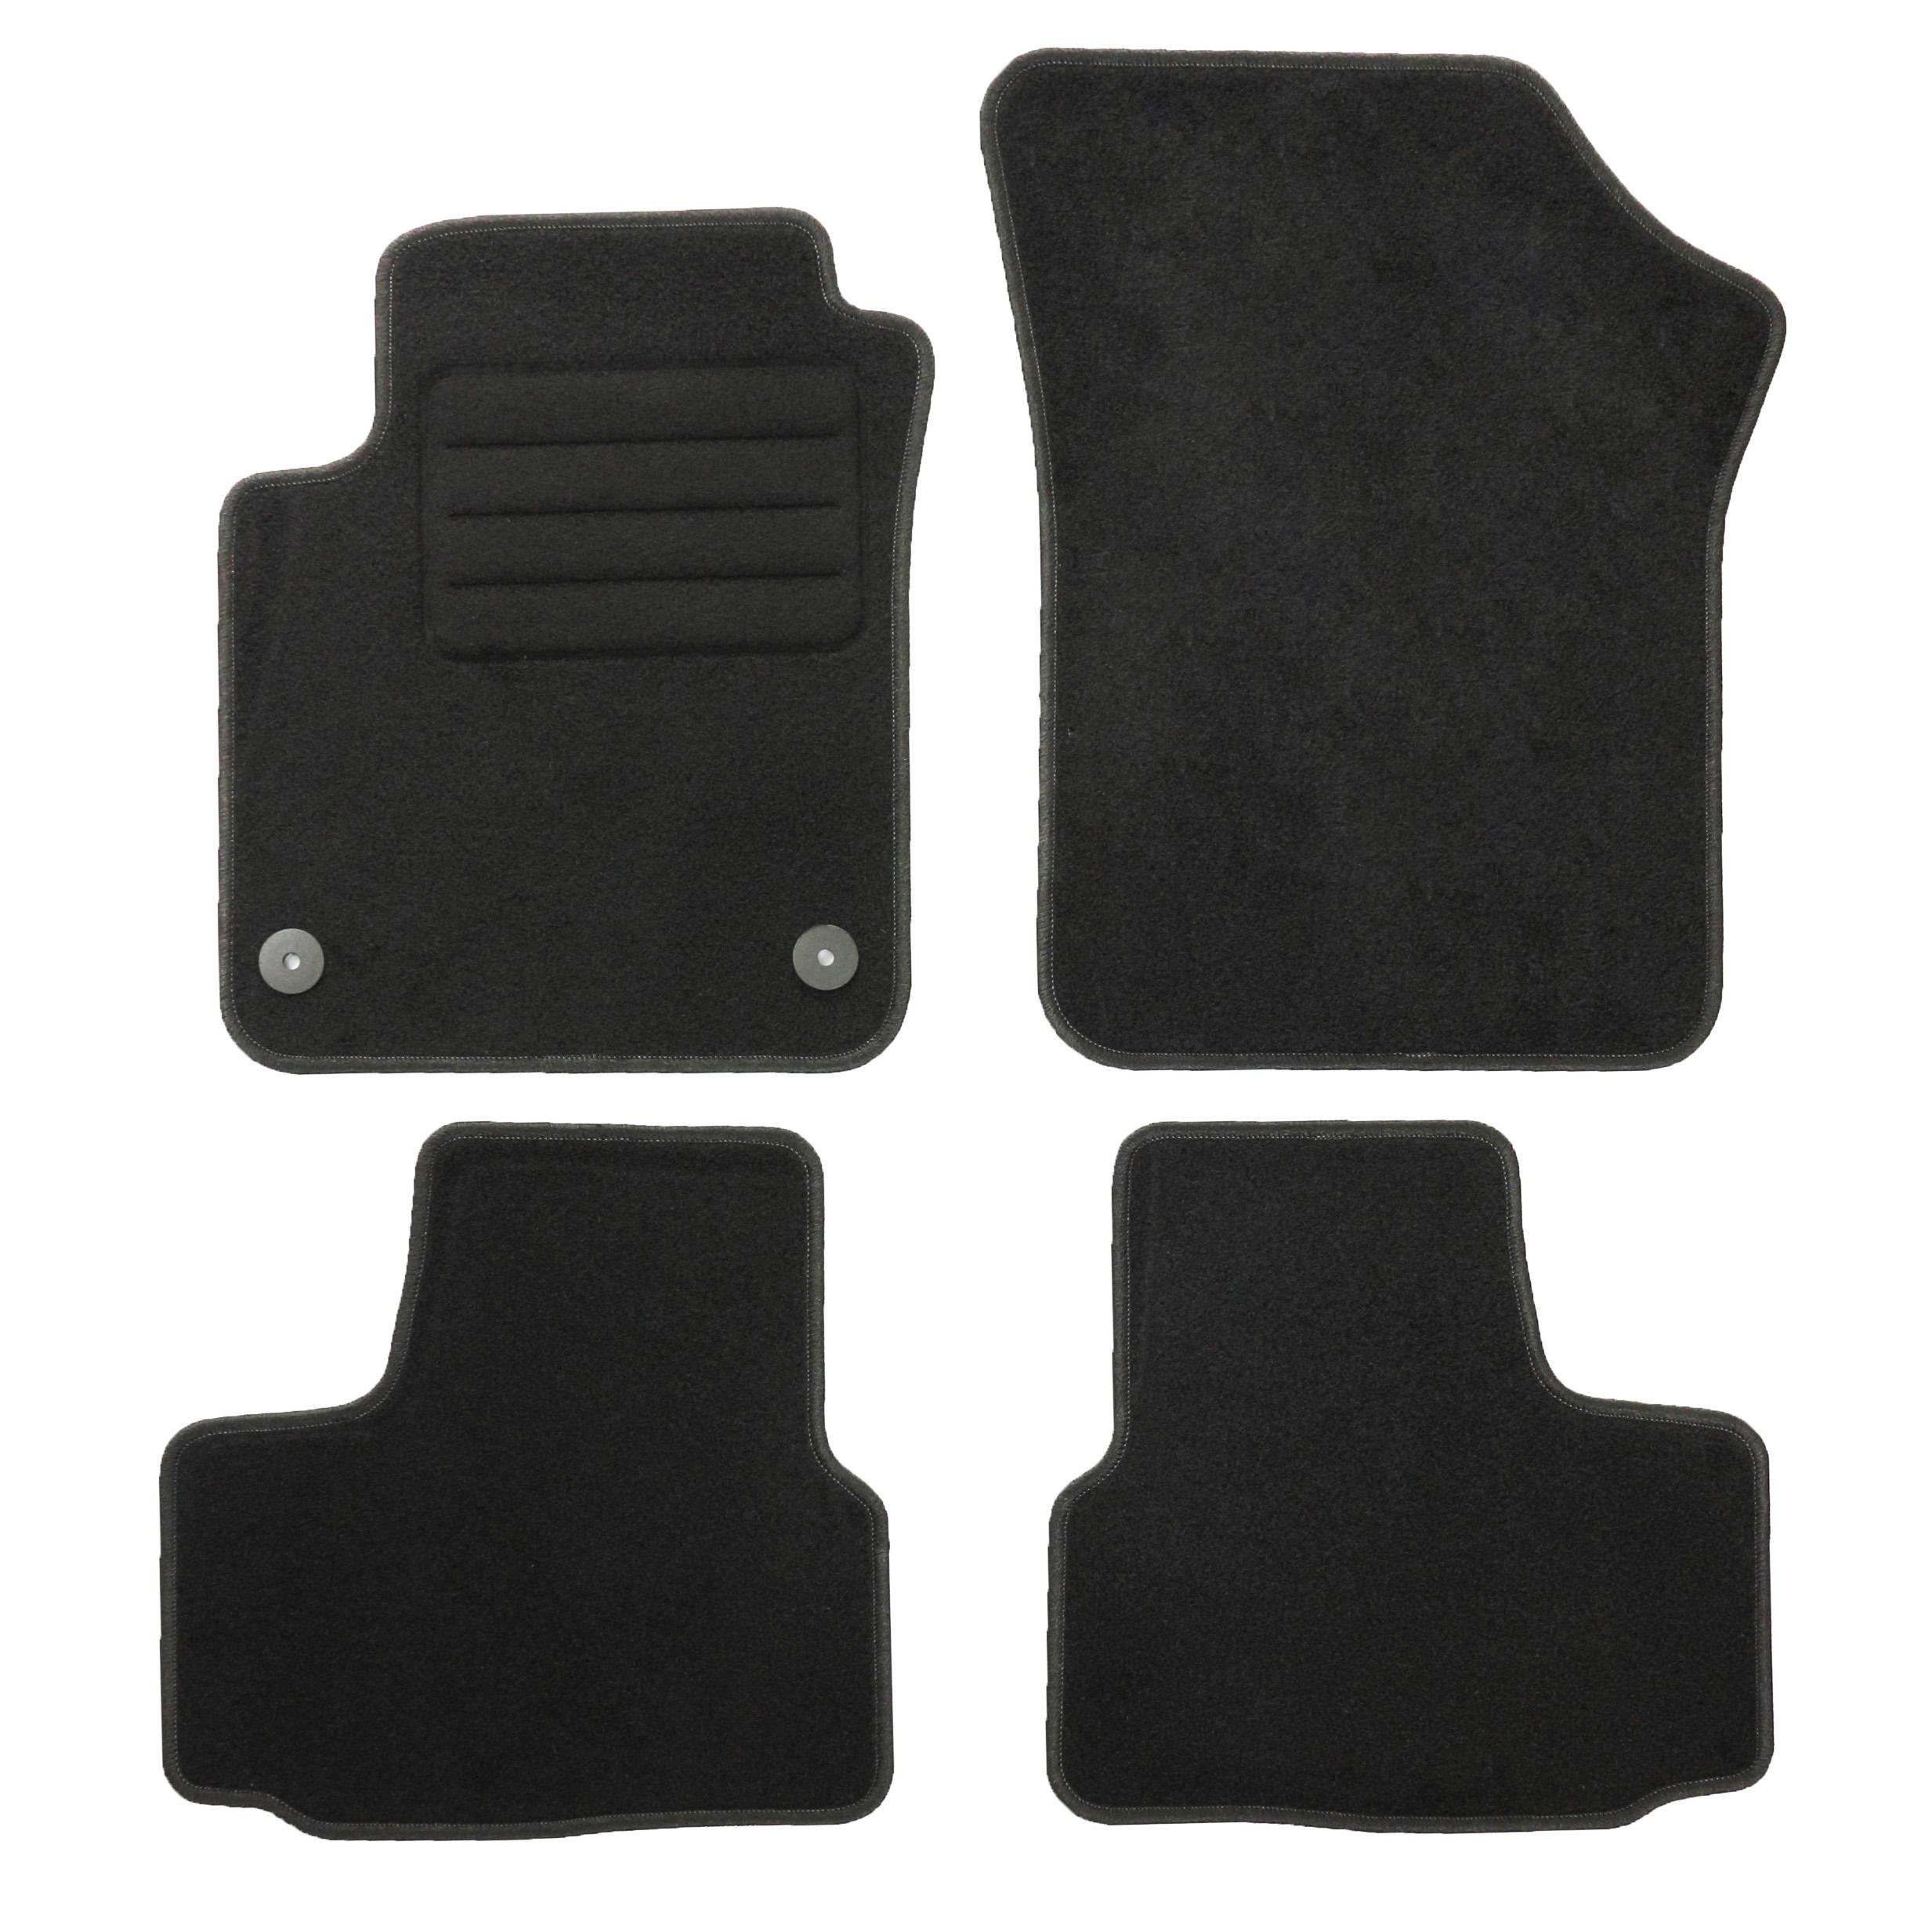 vw up fu matten autoteppiche bj 2011 ebay. Black Bedroom Furniture Sets. Home Design Ideas